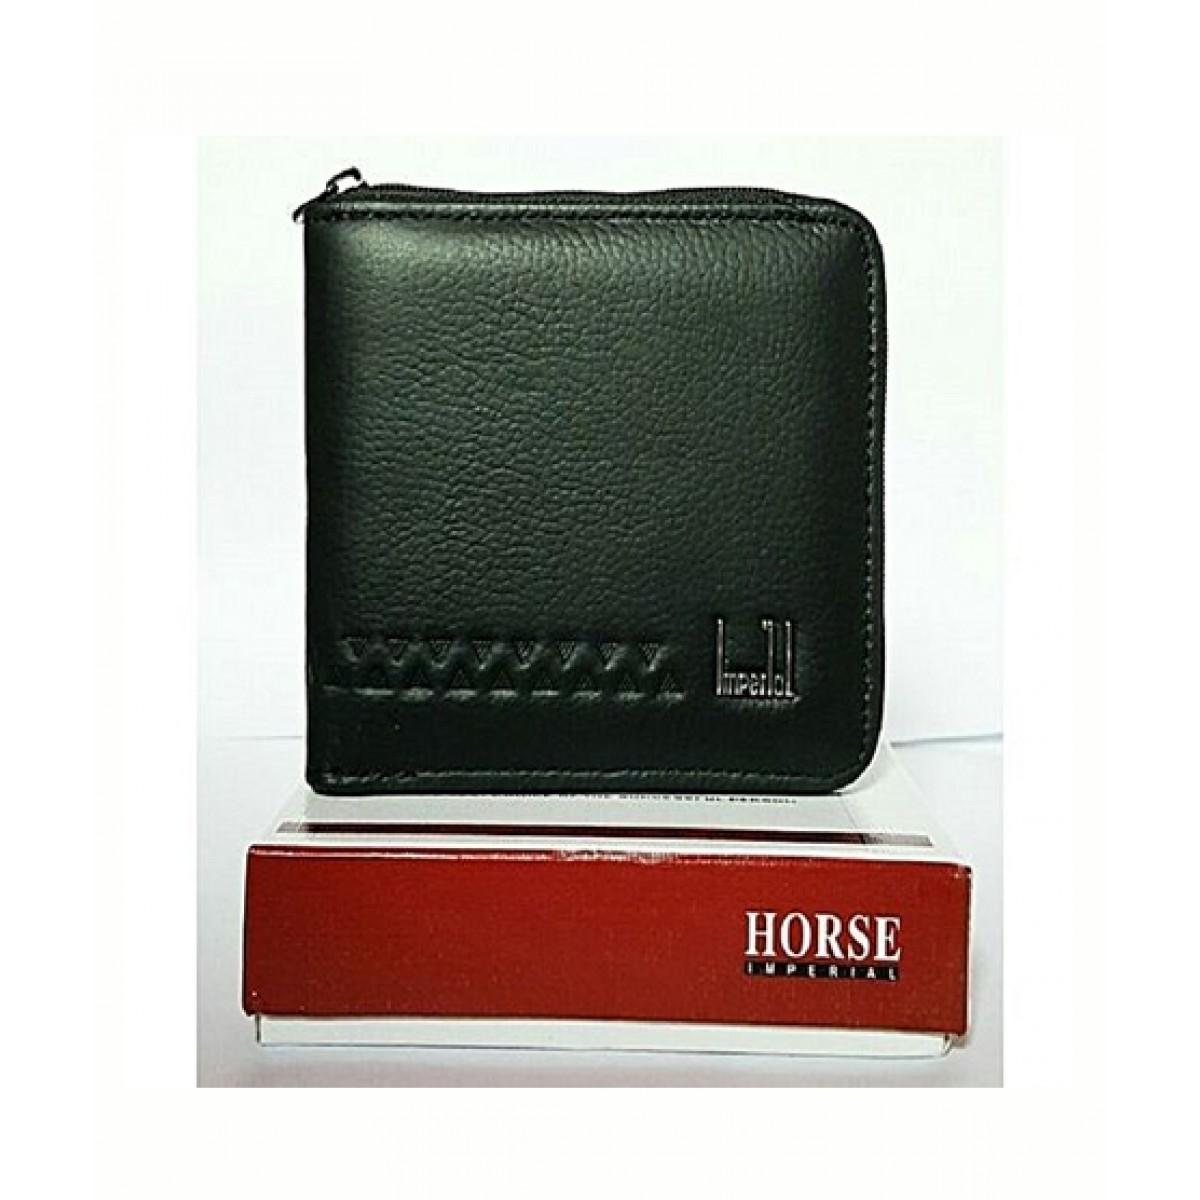 Imperial Horse Zipper Leather Wallet For Men Black